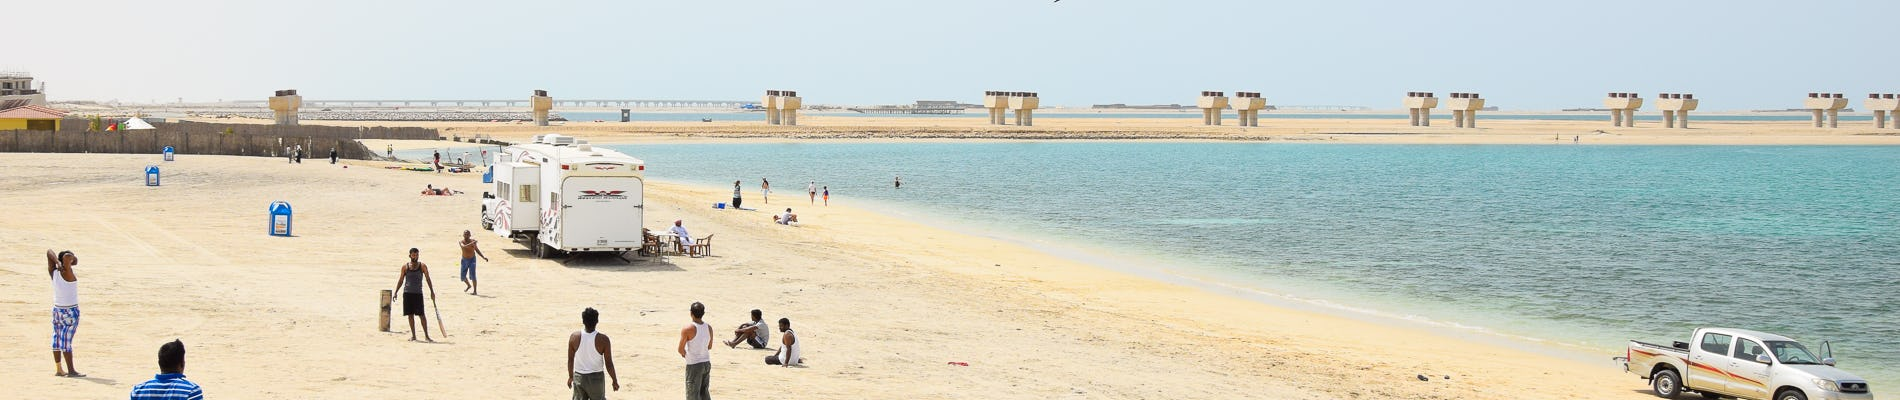 Lama Beach Club Jebel Ali